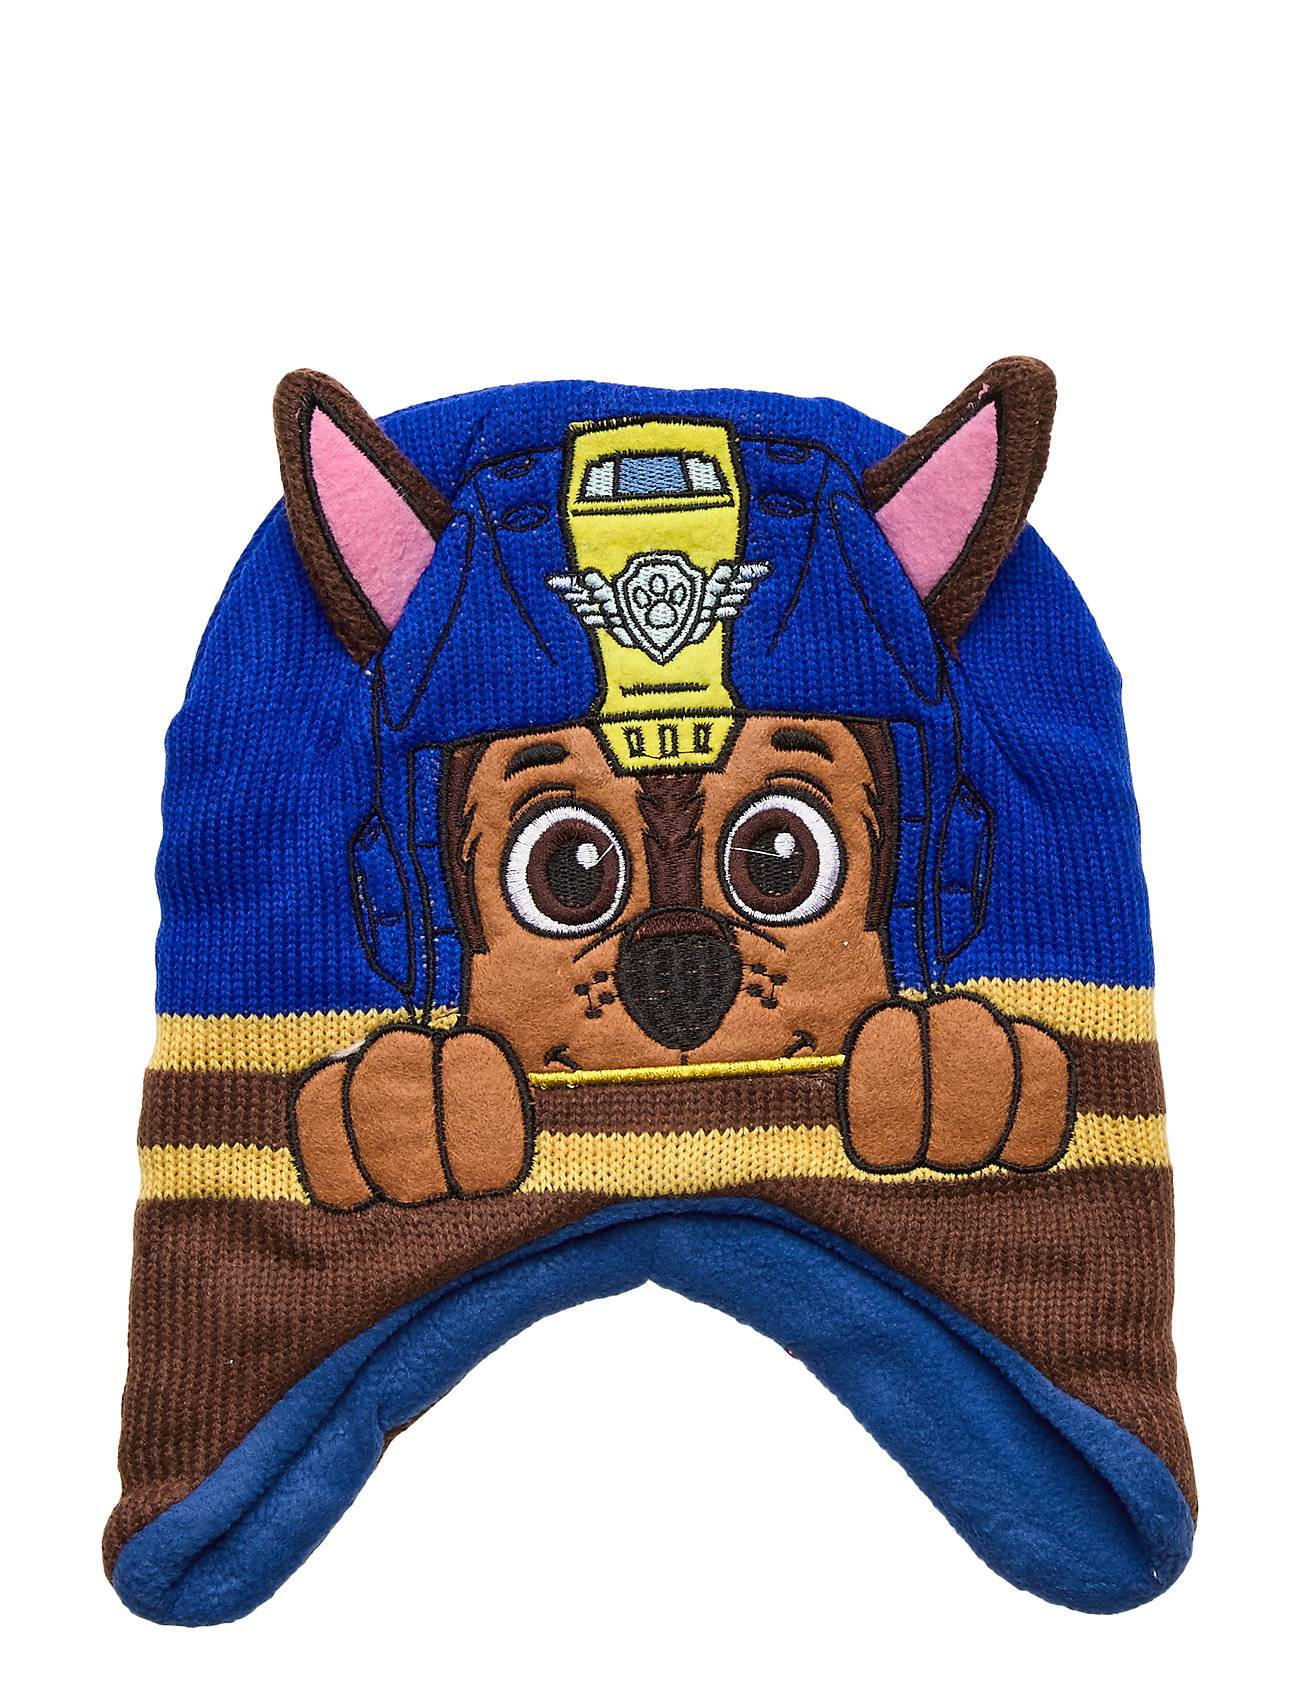 Paw Patrol Peruvien Accessories Headwear Hats Sininen Paw Patrol